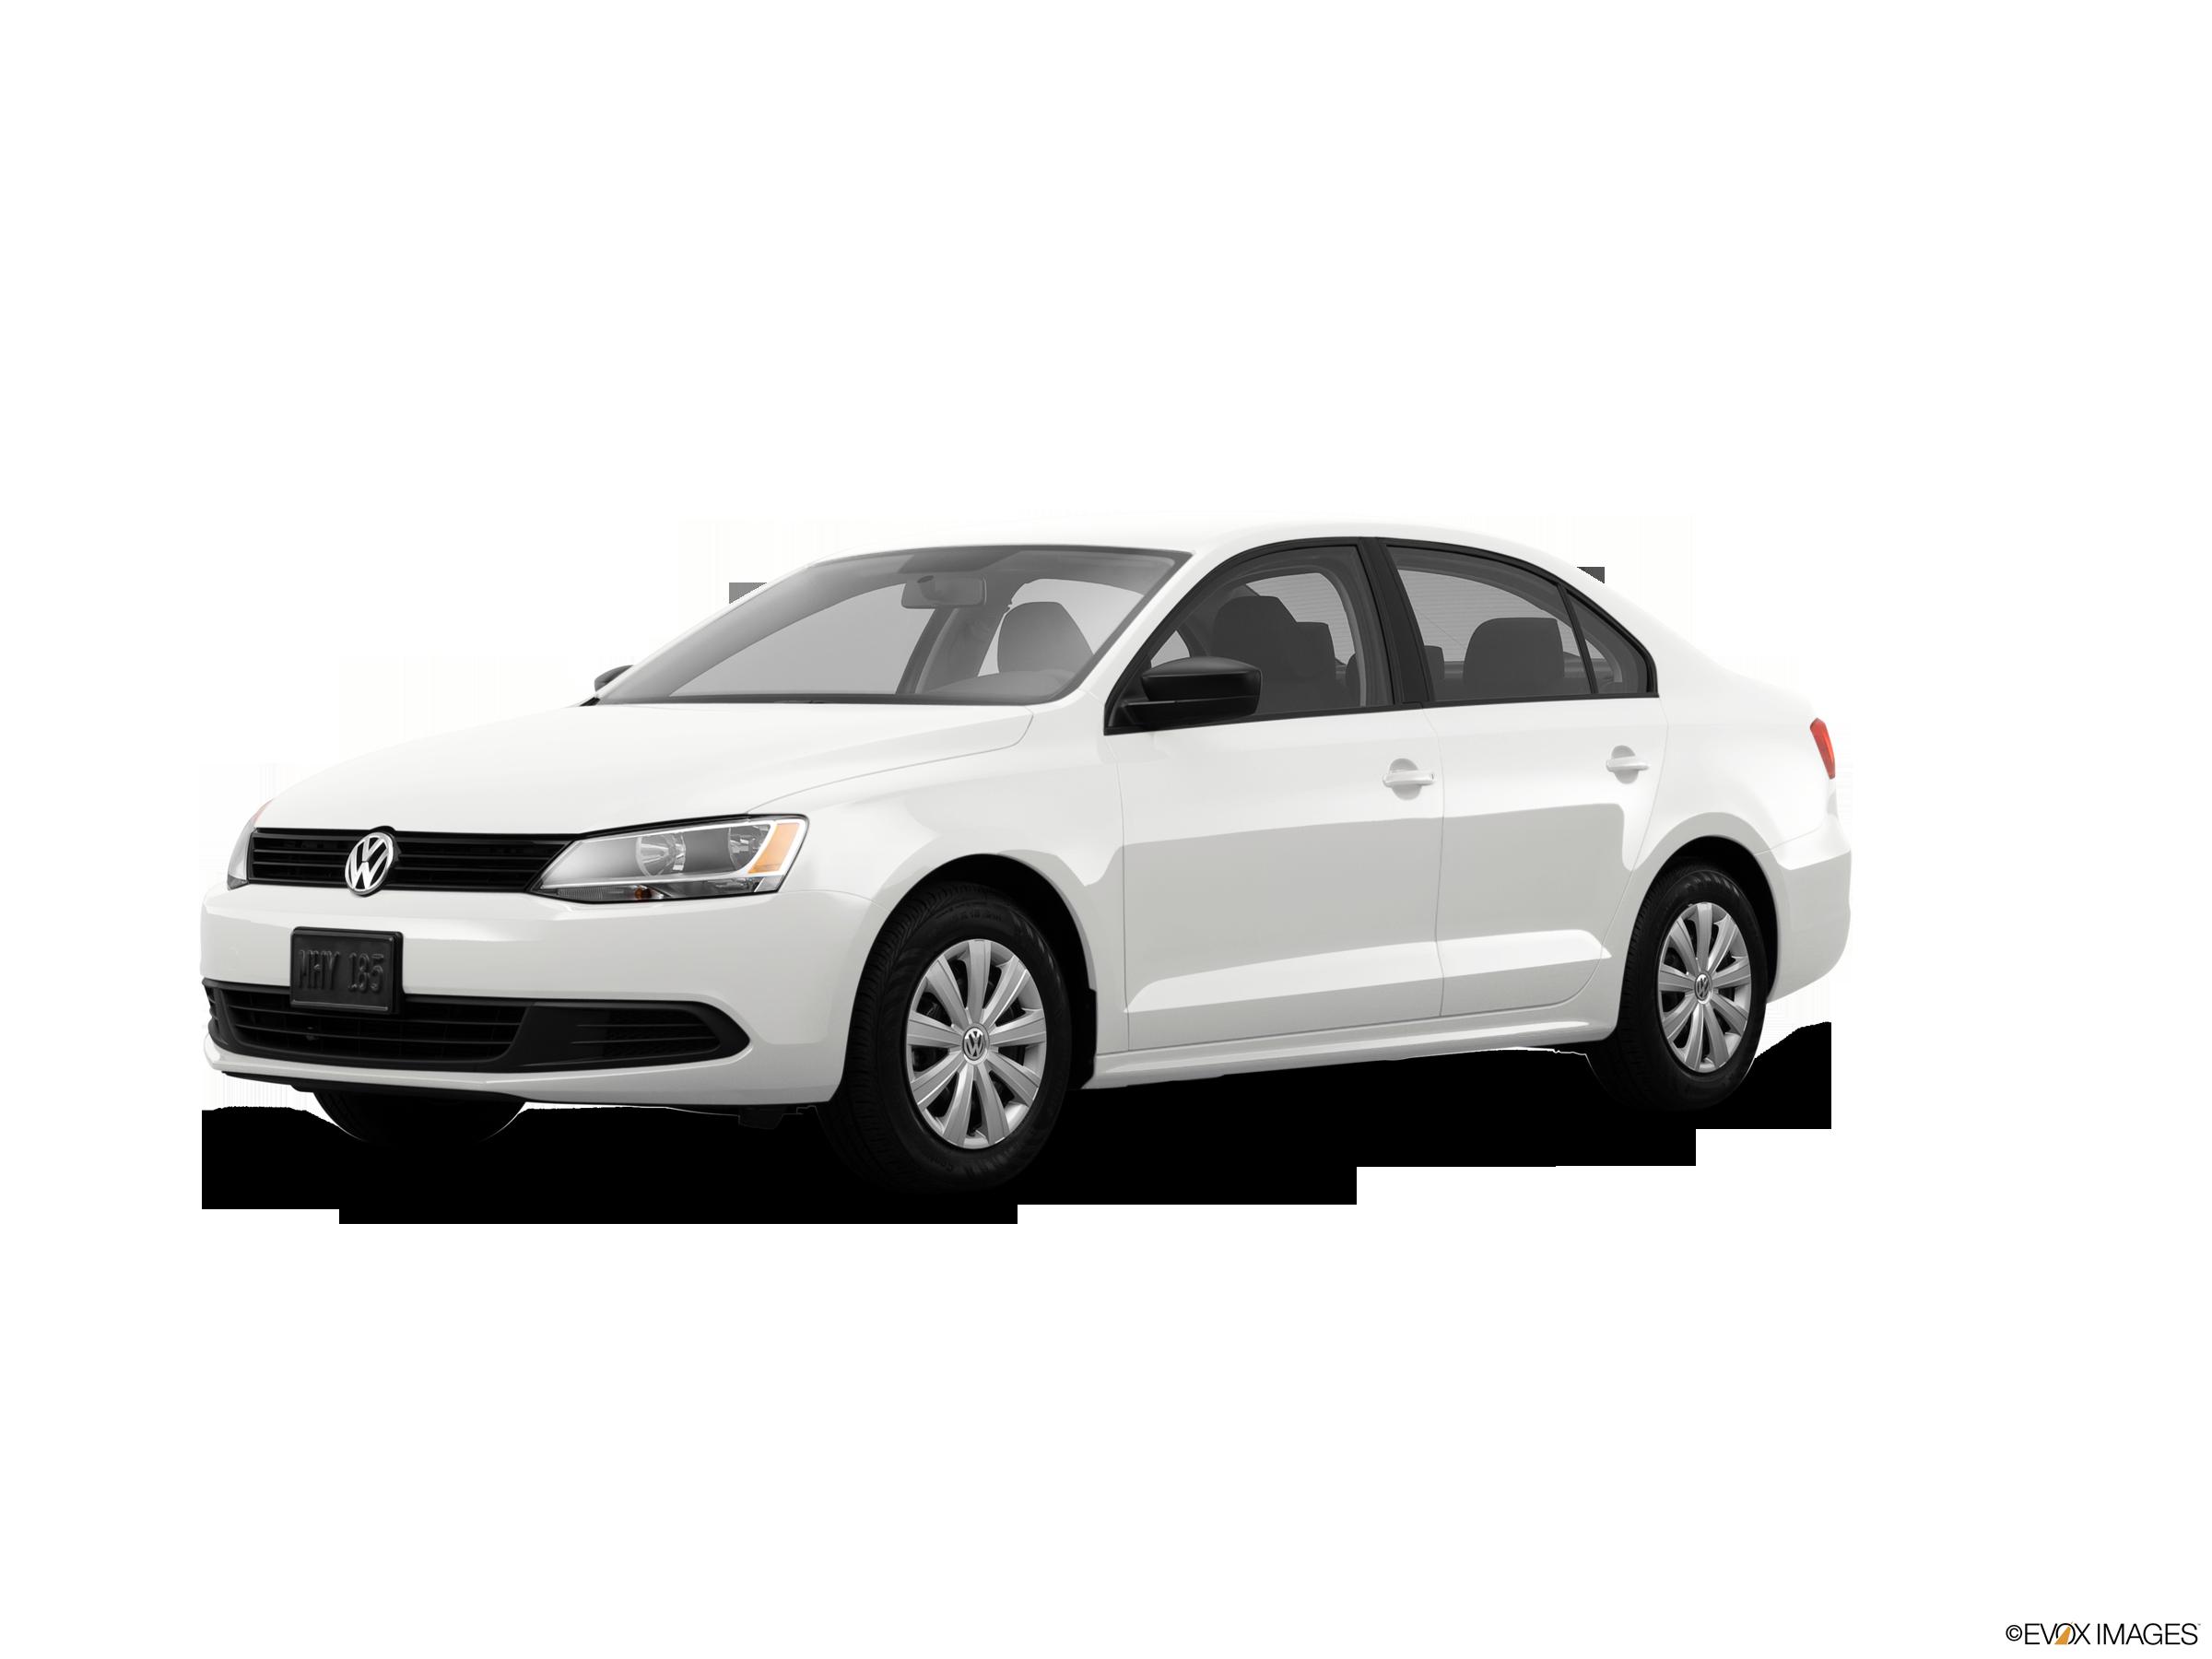 2014 Volkswagen Jetta Values Cars For Sale Kelley Blue Book